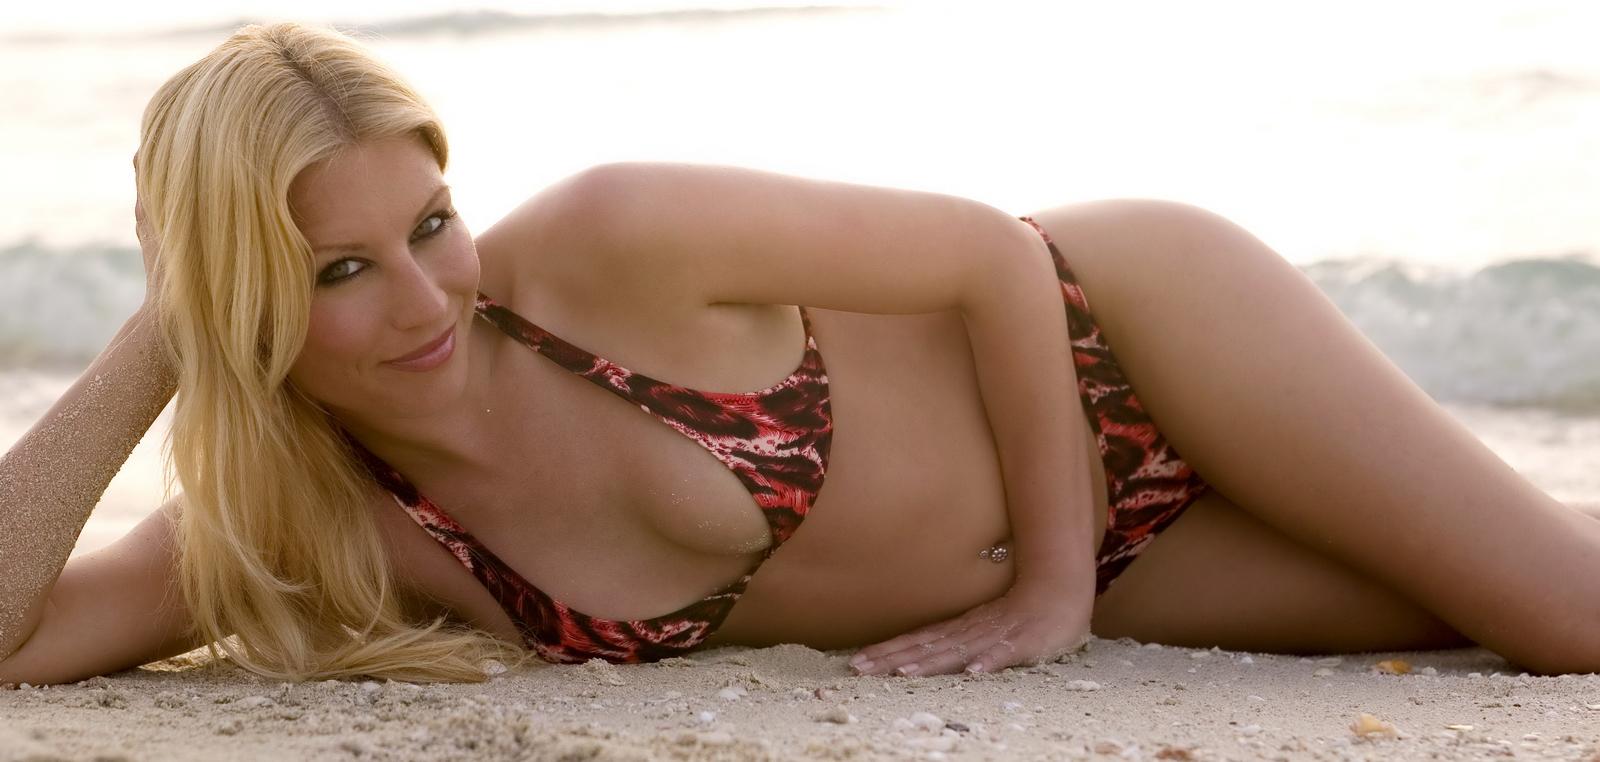 Rainy Sweet Denise Van Outen Sexy Bikini Hot Ass Wahb -9698